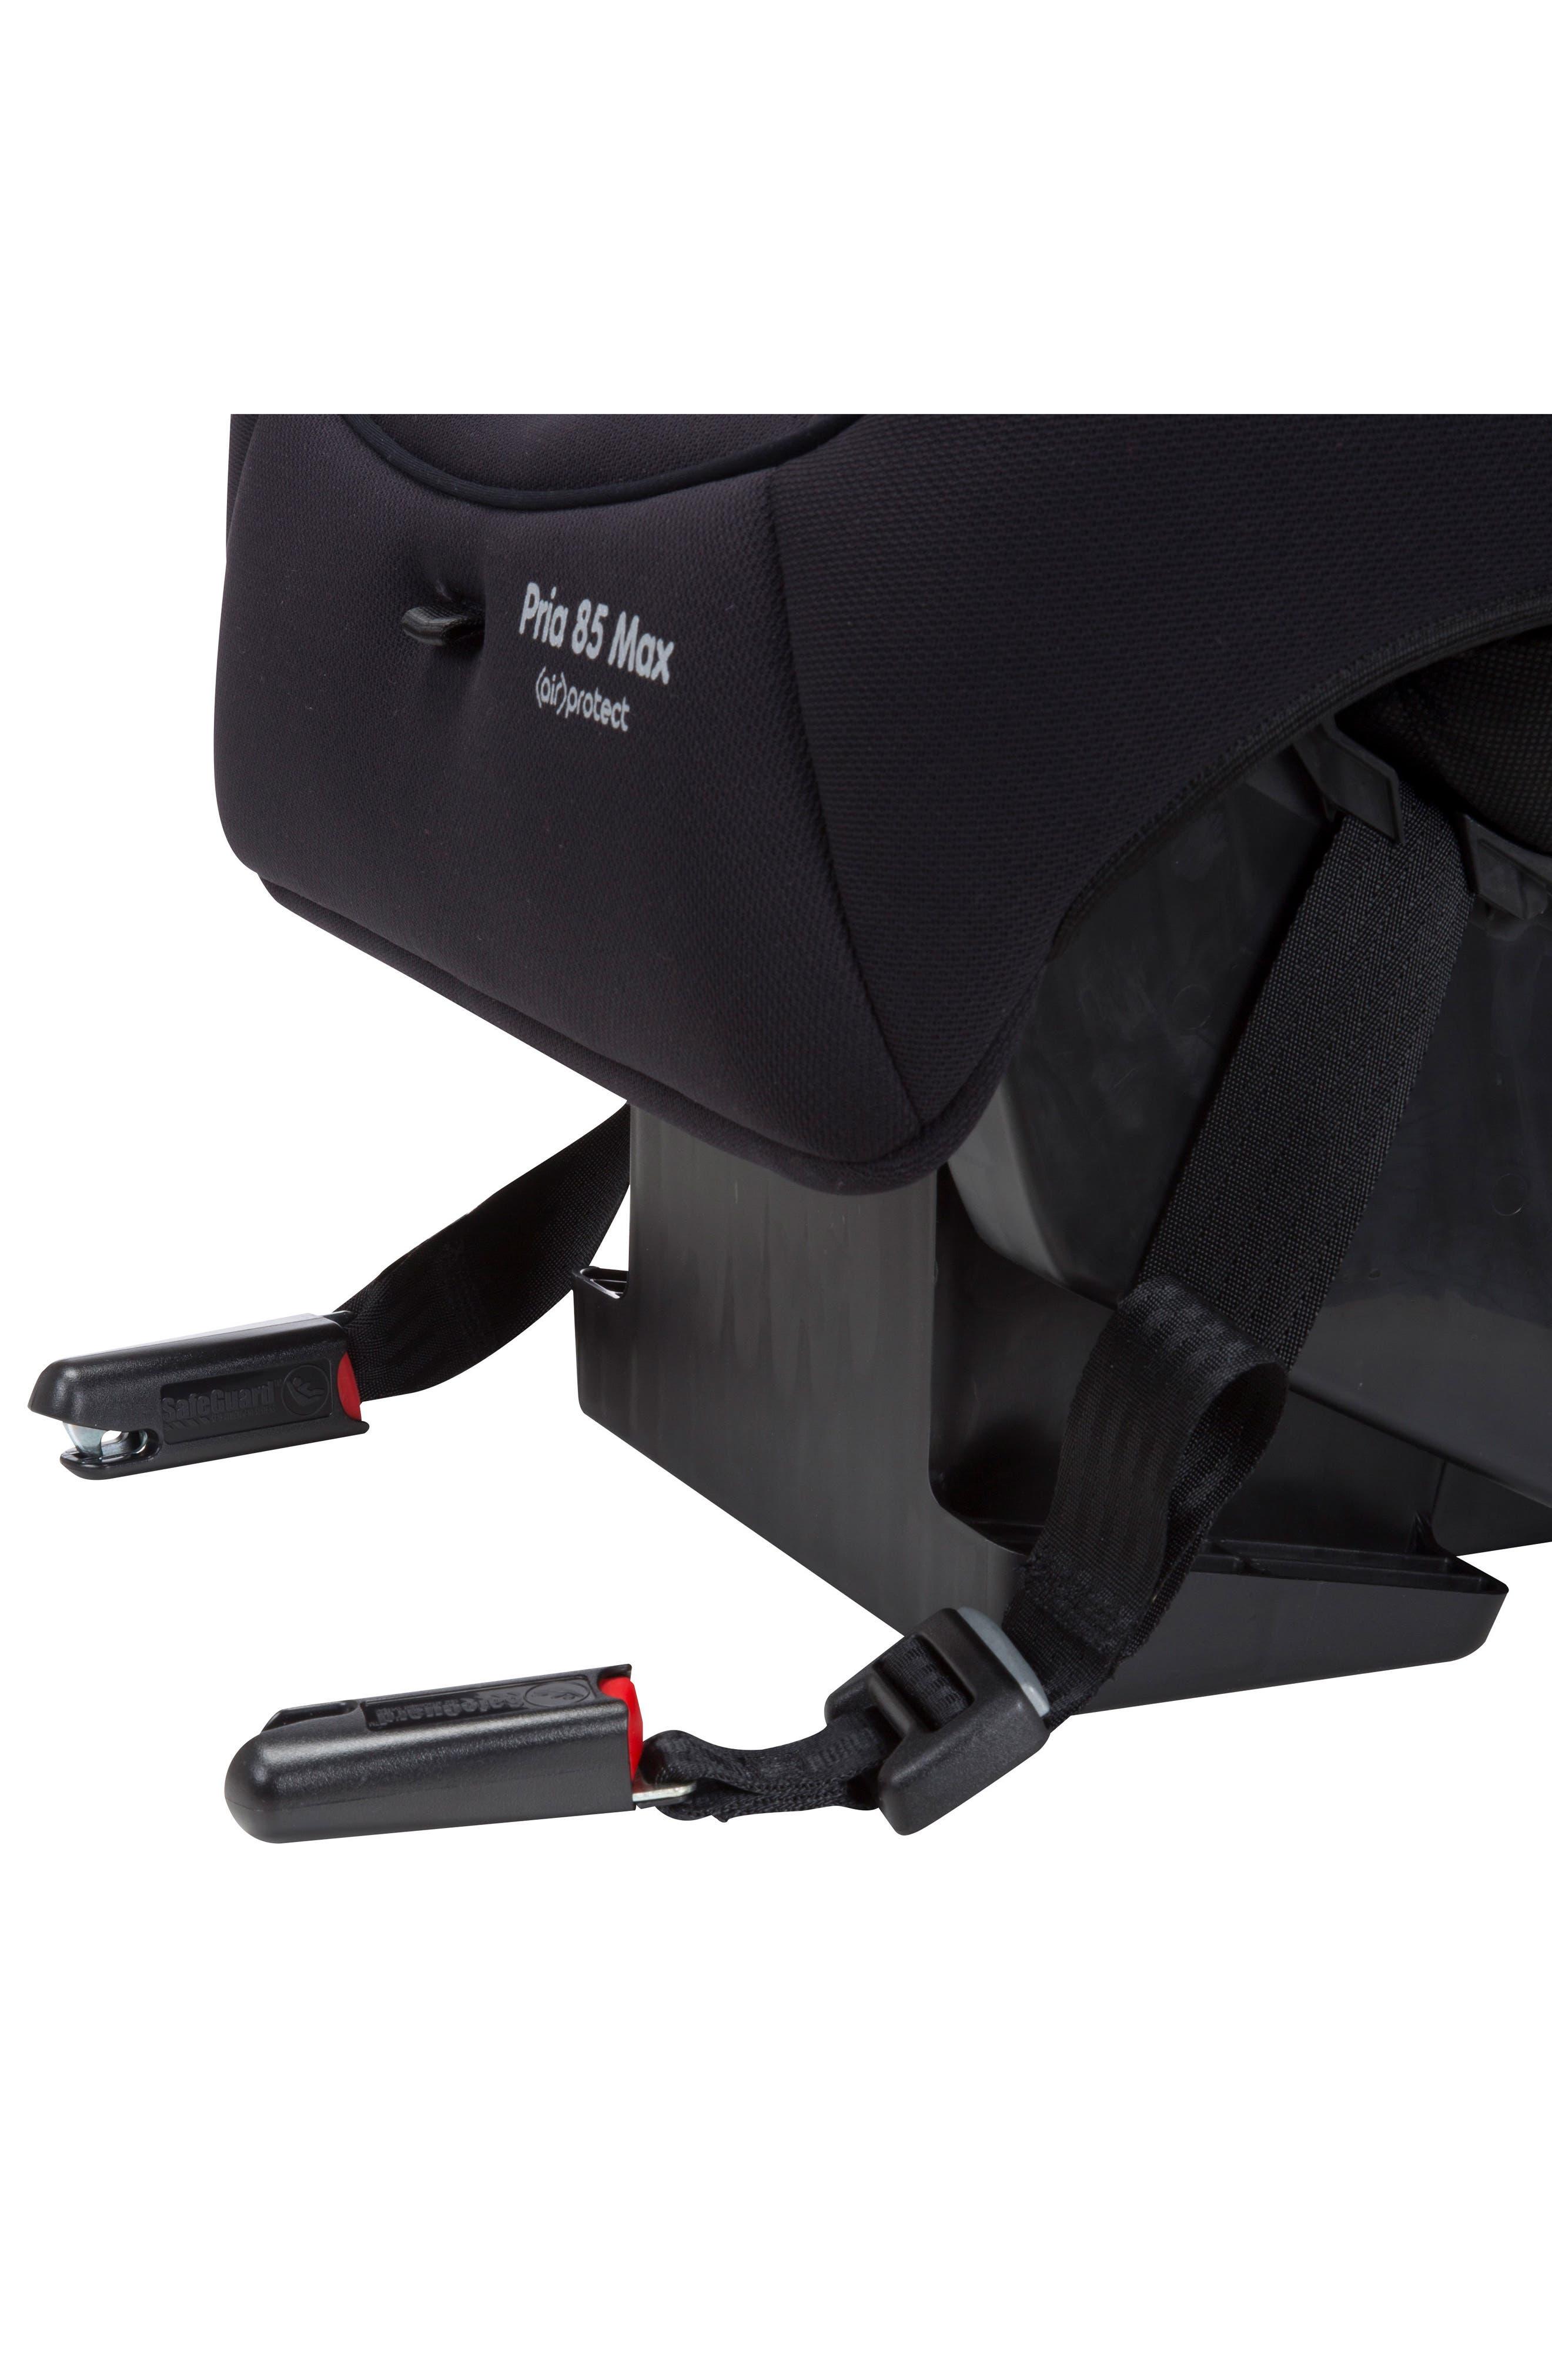 Pria<sup>™</sup> 85 Max Convertible Car Seat,                             Alternate thumbnail 13, color,                             Night Black